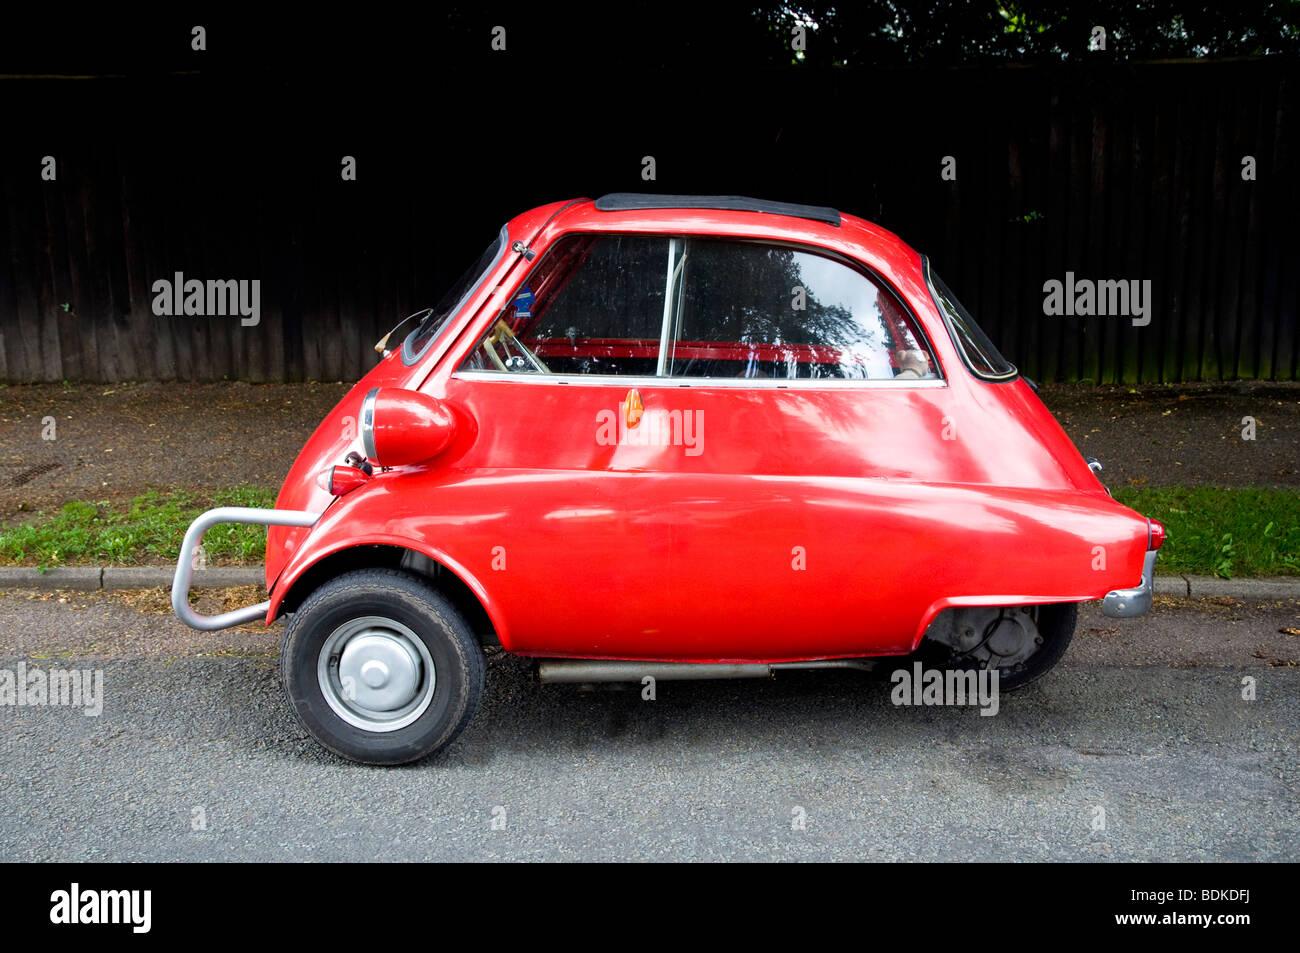 Red Bubble Sports Car S Concept Car